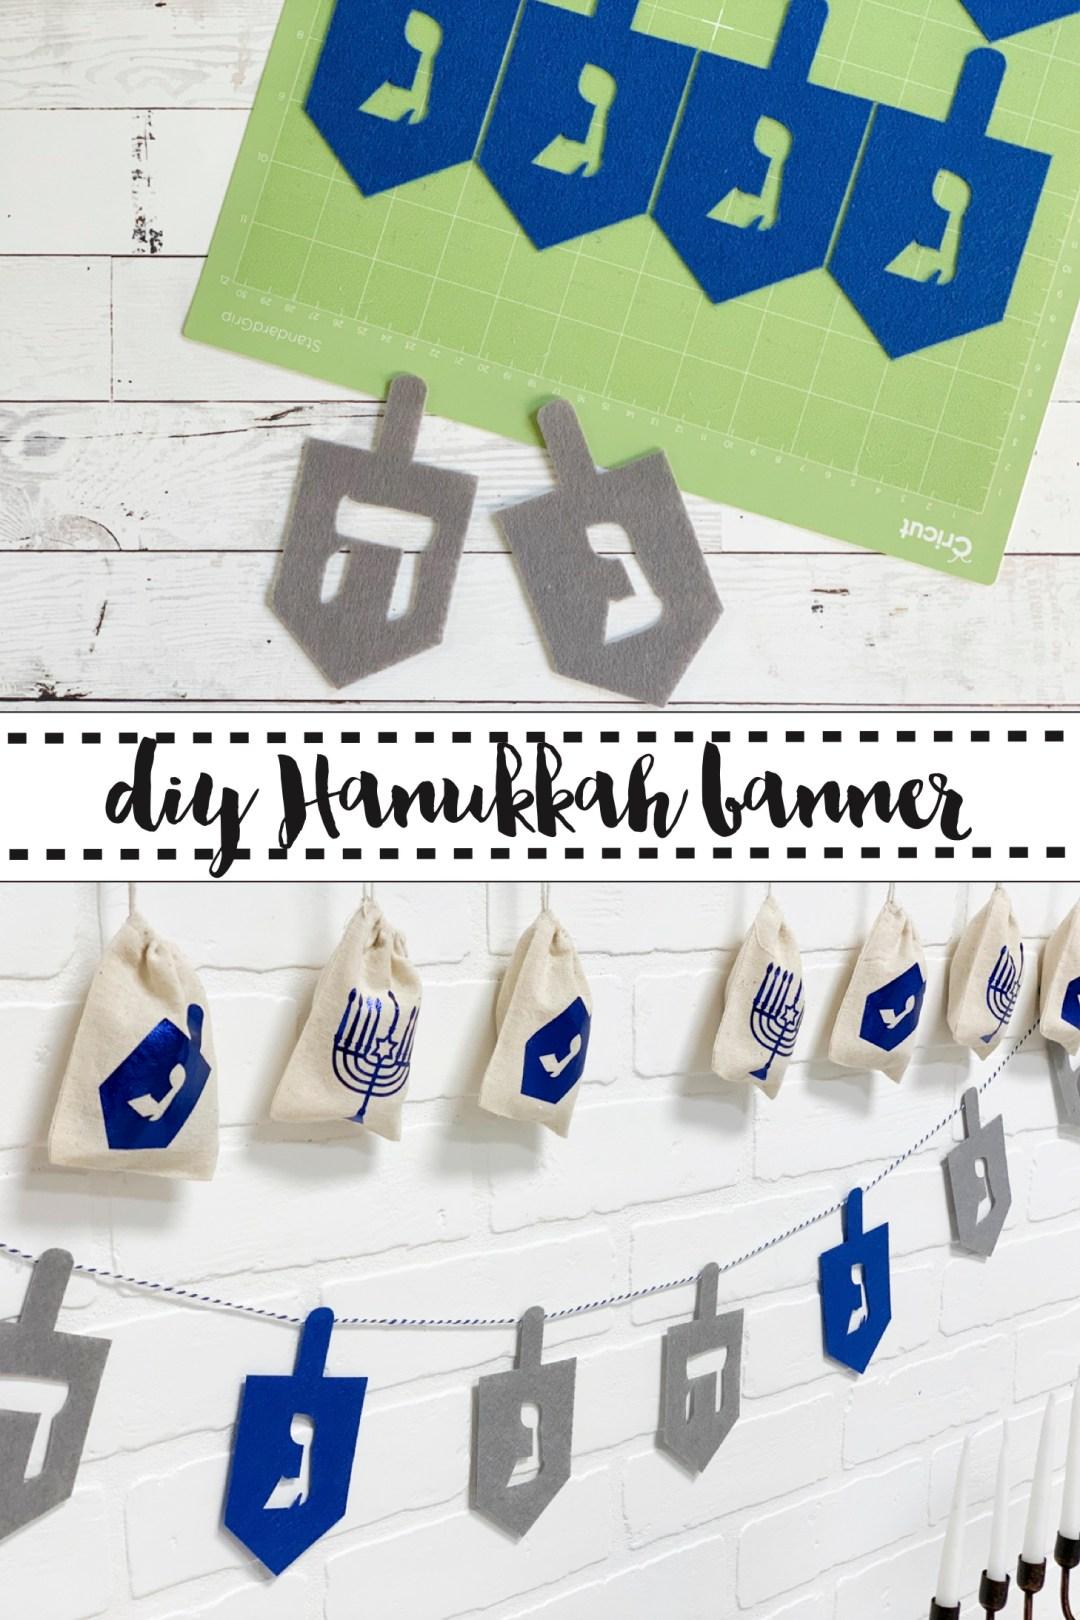 DIY Hanukkah Banner